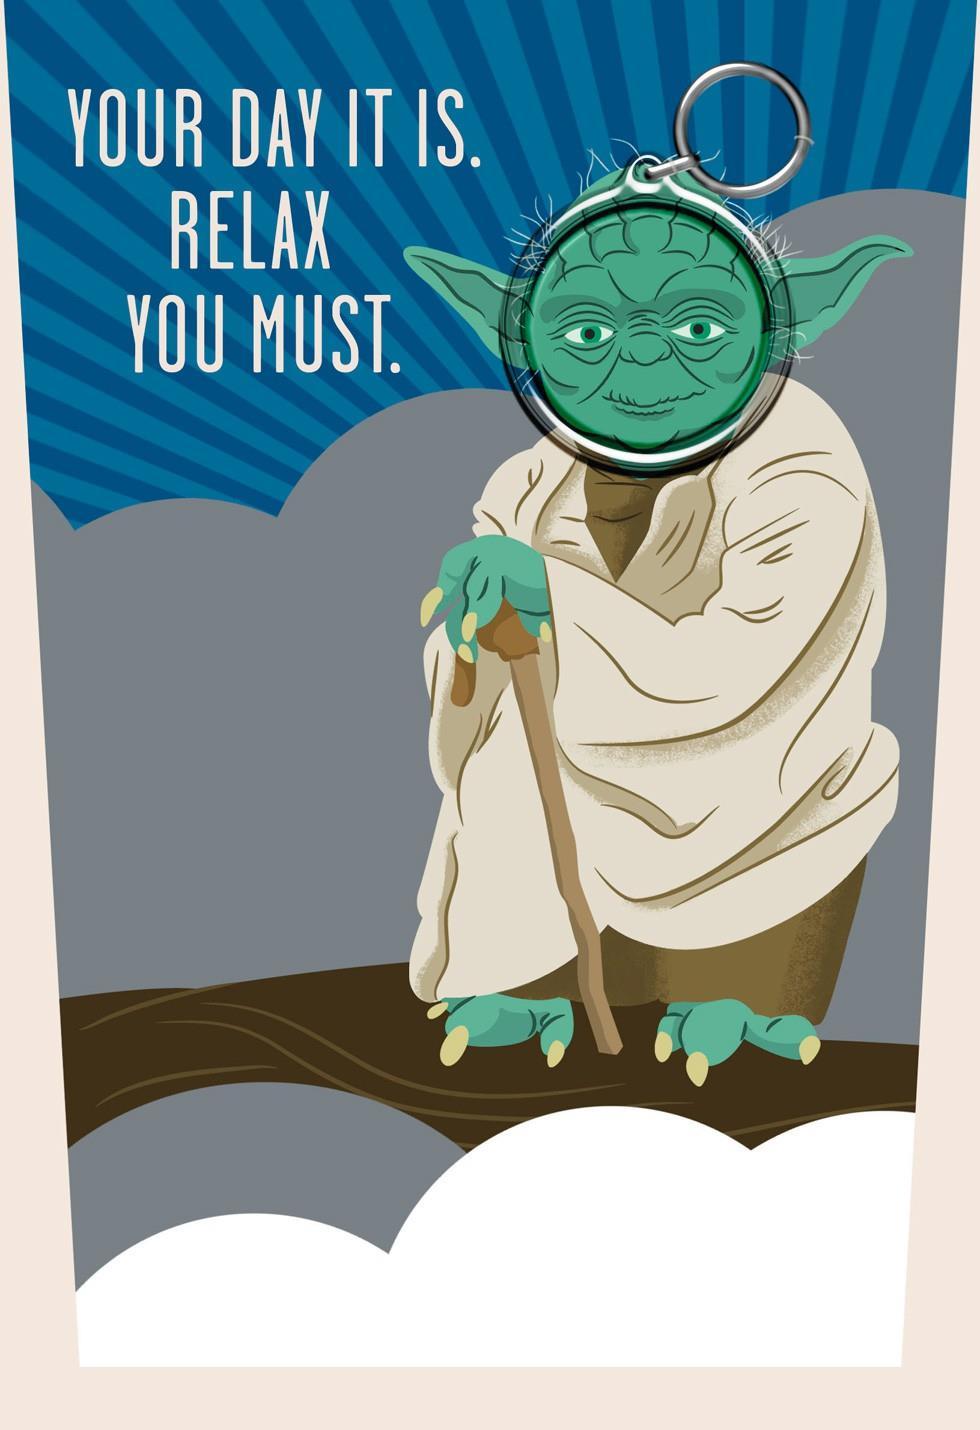 Star Wars Yoda Fathers Day Card With Keychain